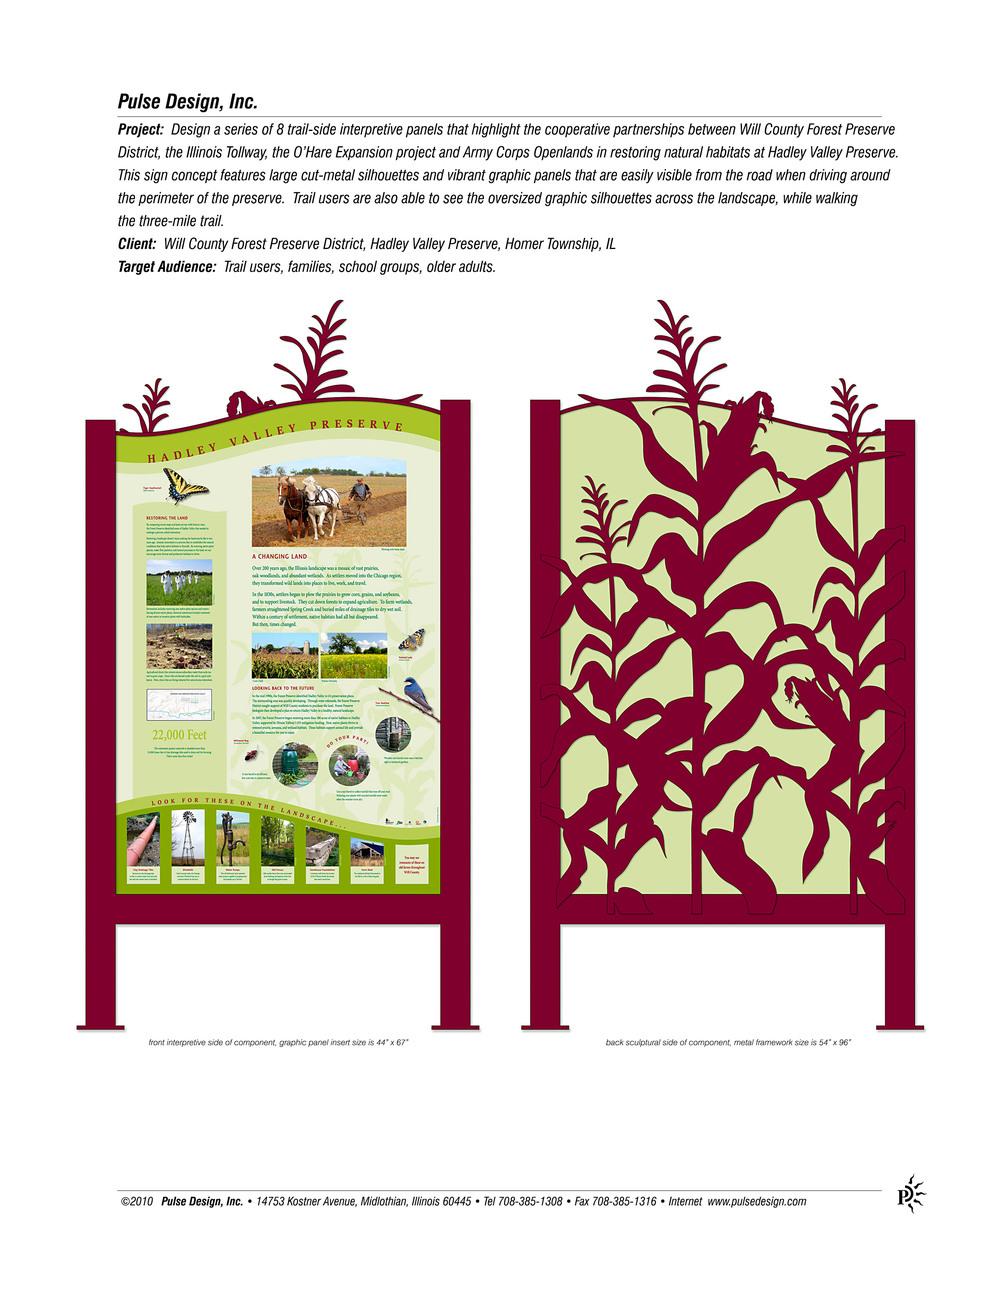 Hadley-Valley-Trail-Sign-Corn-Lg-Pulse-Design-Inc.jpg